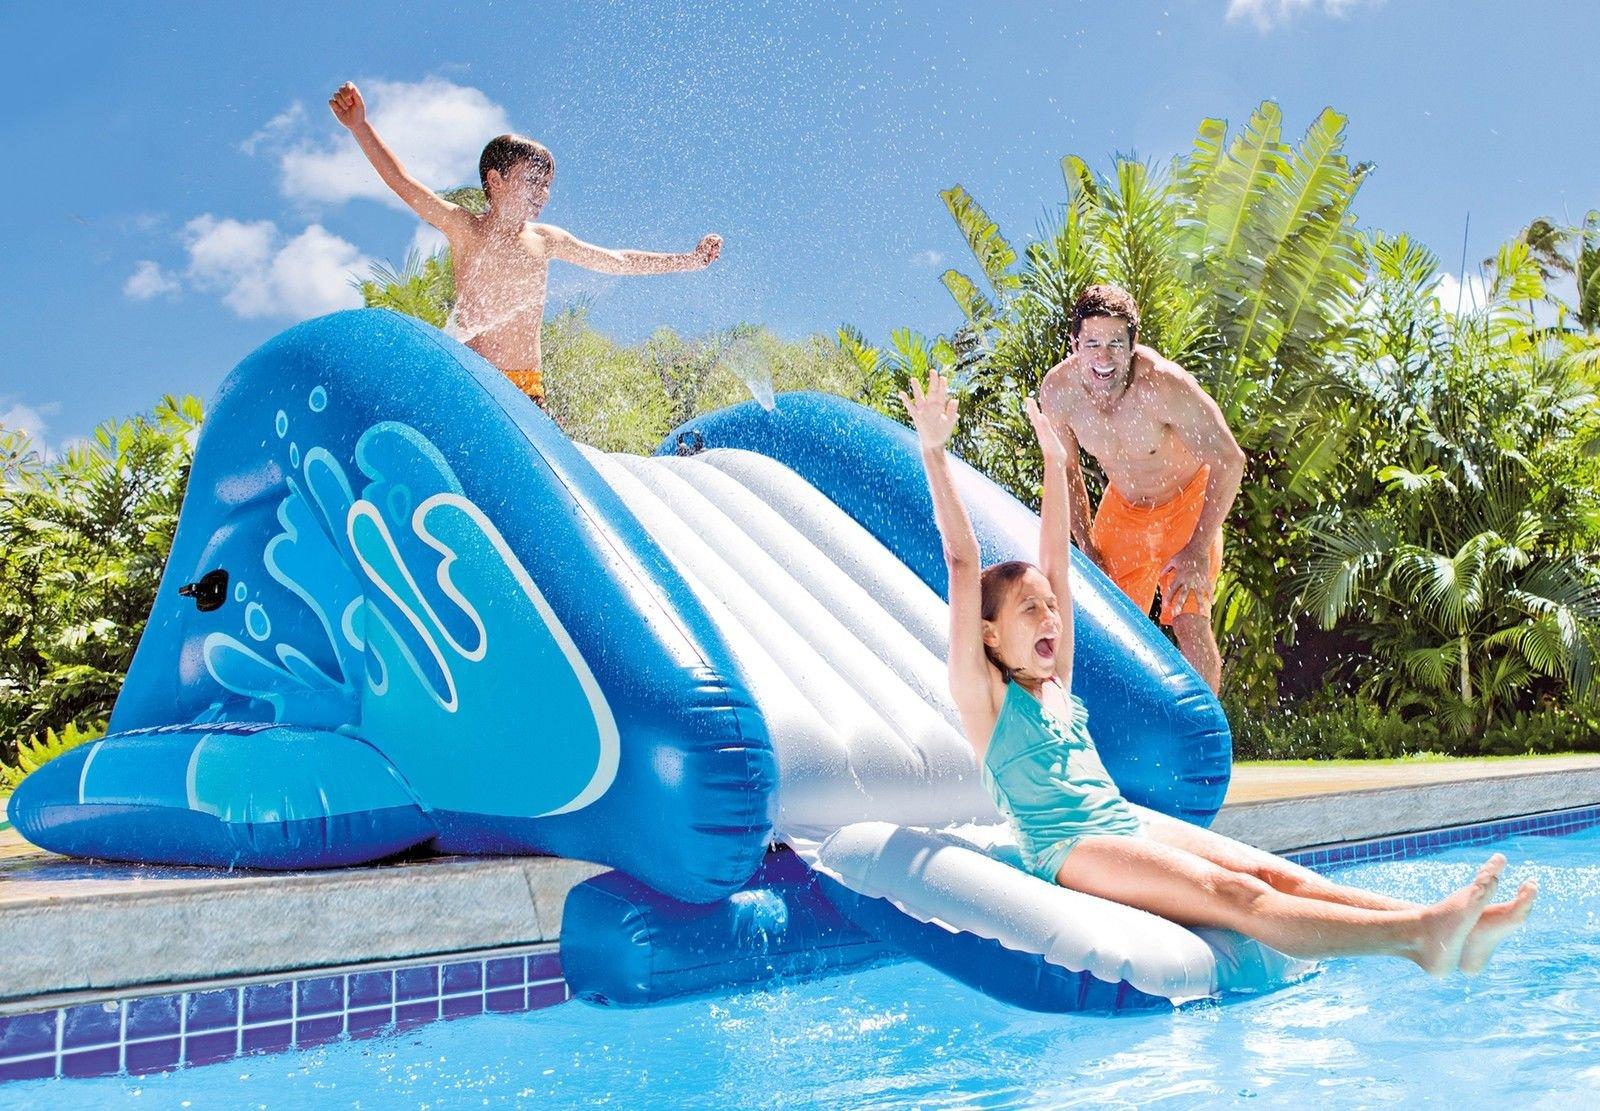 Alek...Shop Water Slide Accessory Play Swimming Pool Inflatable Splash Slide Kids Easy Fun Game Family Center Slide by Alek...Shop (Image #4)